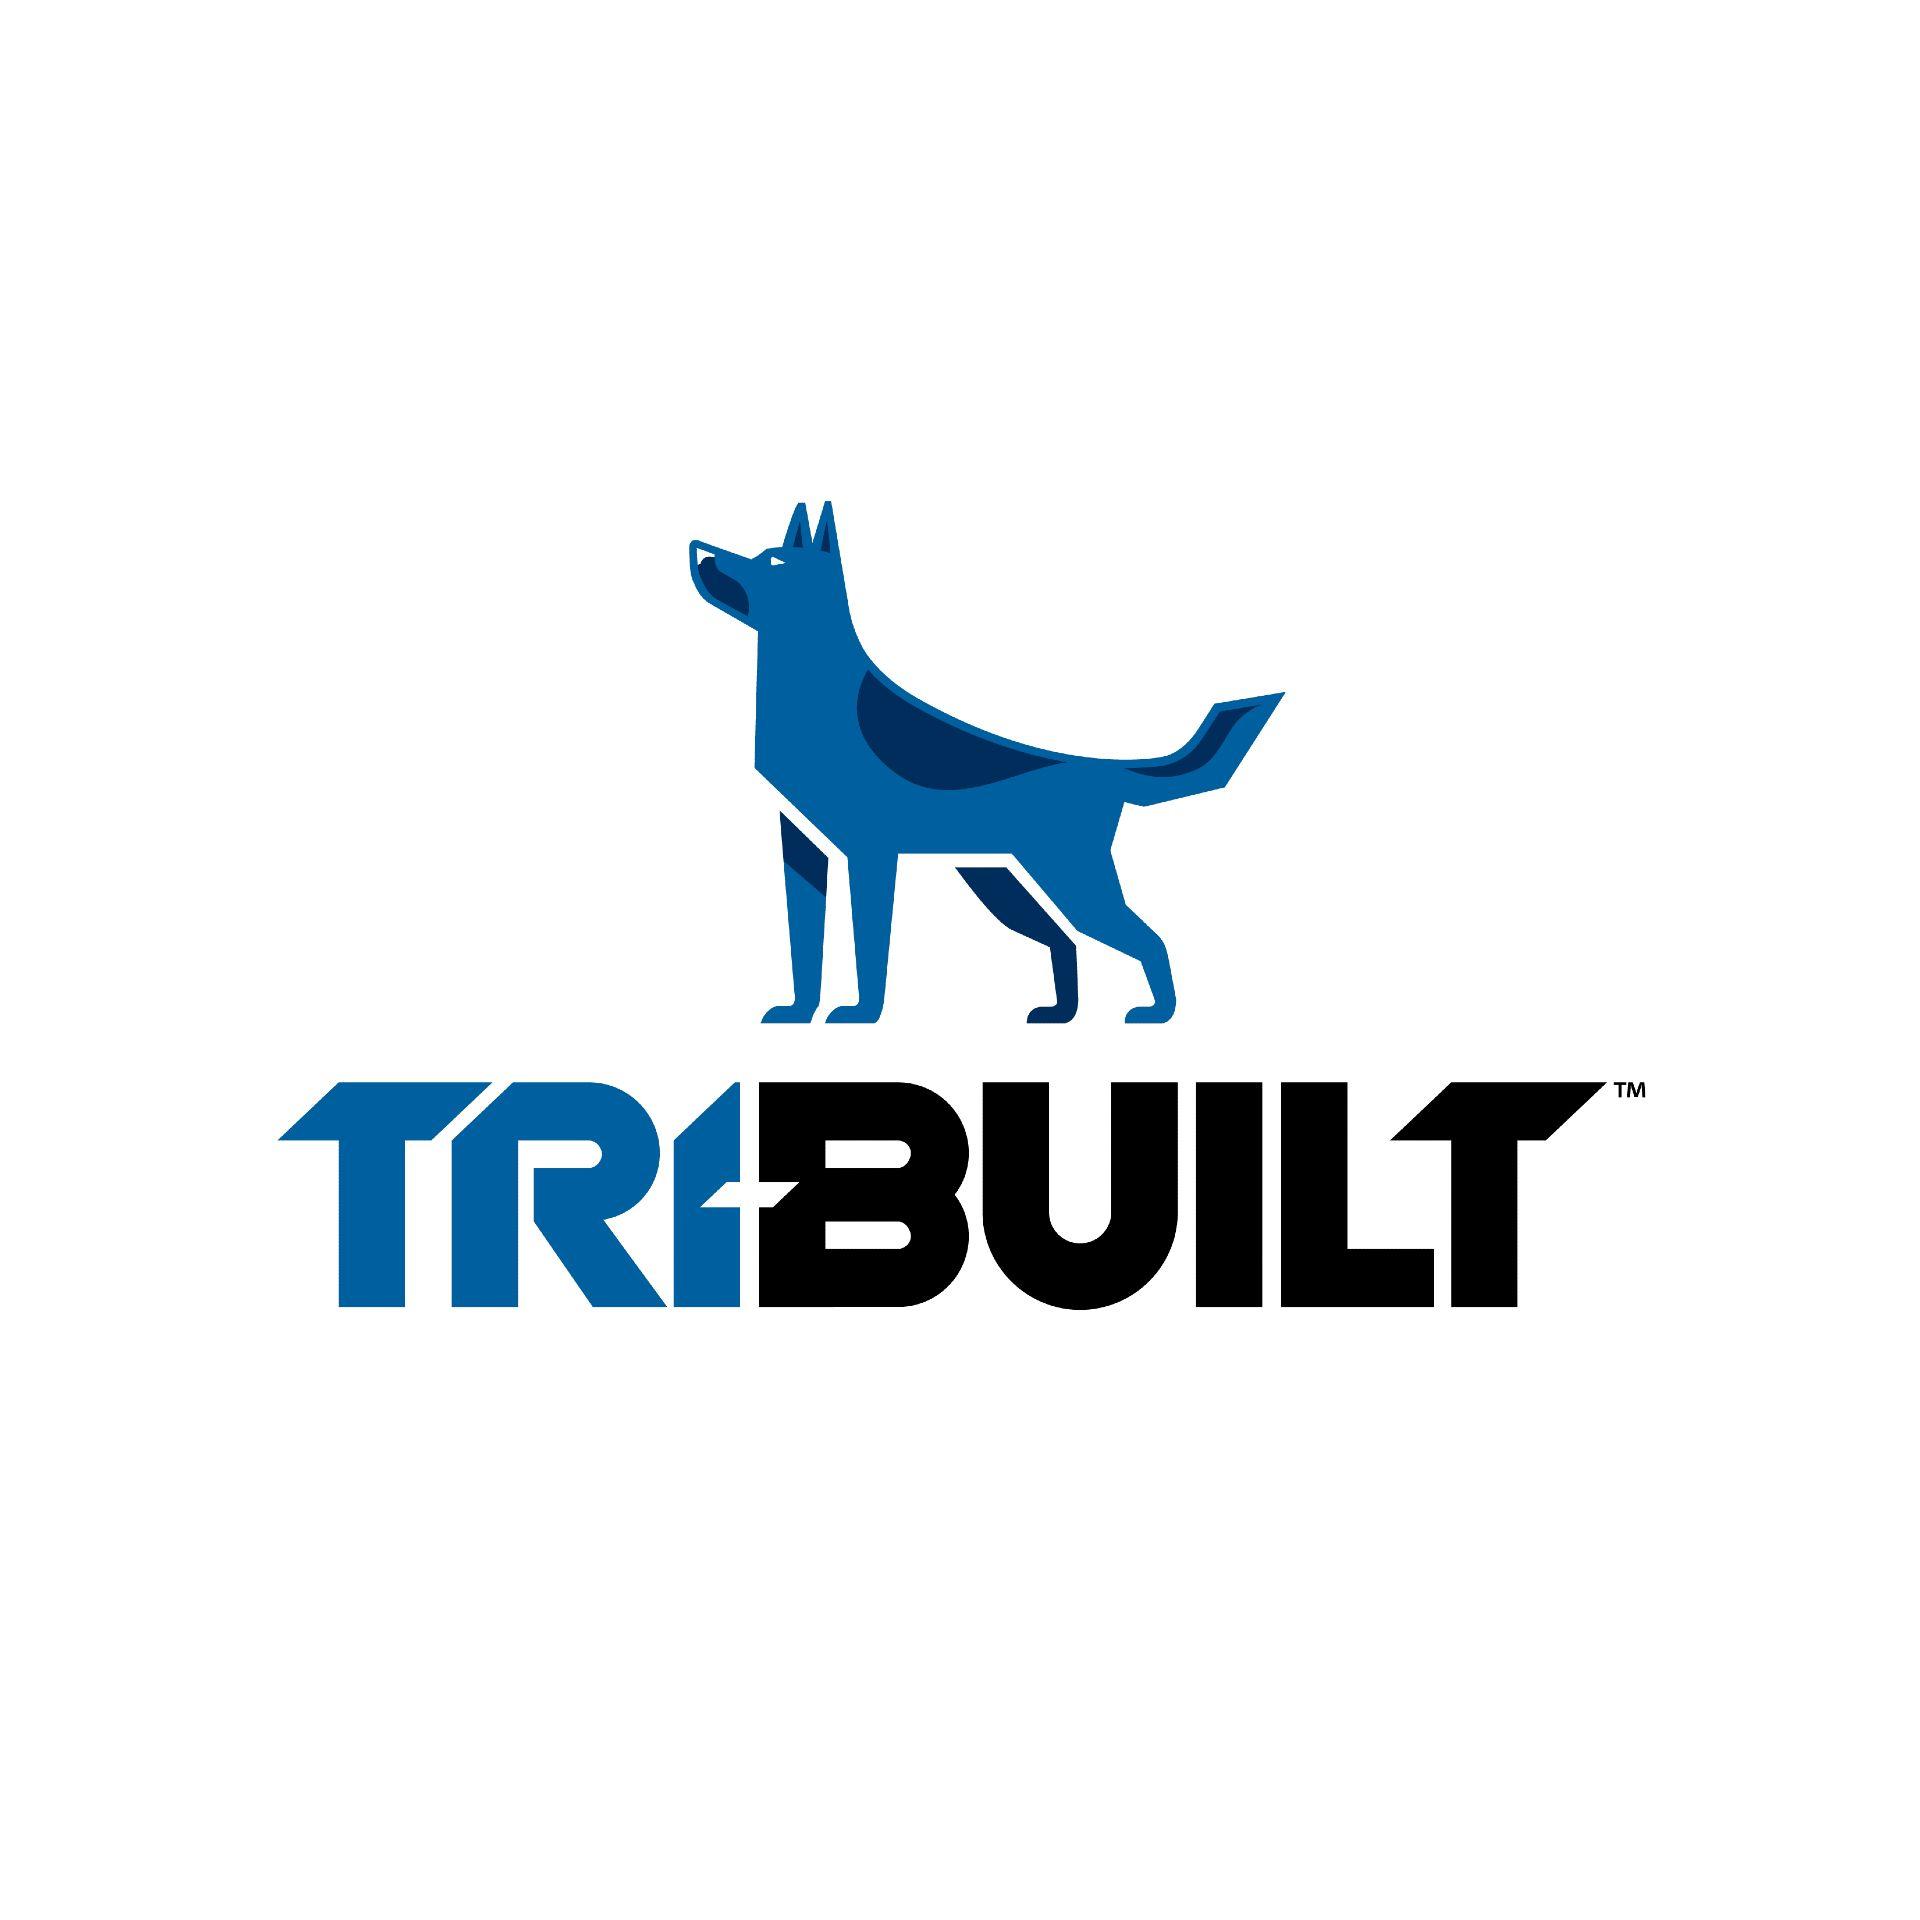 "TRI-BUILT 1/2"" 4' x 8' High Density Fiberboard Coated on 1 Side"